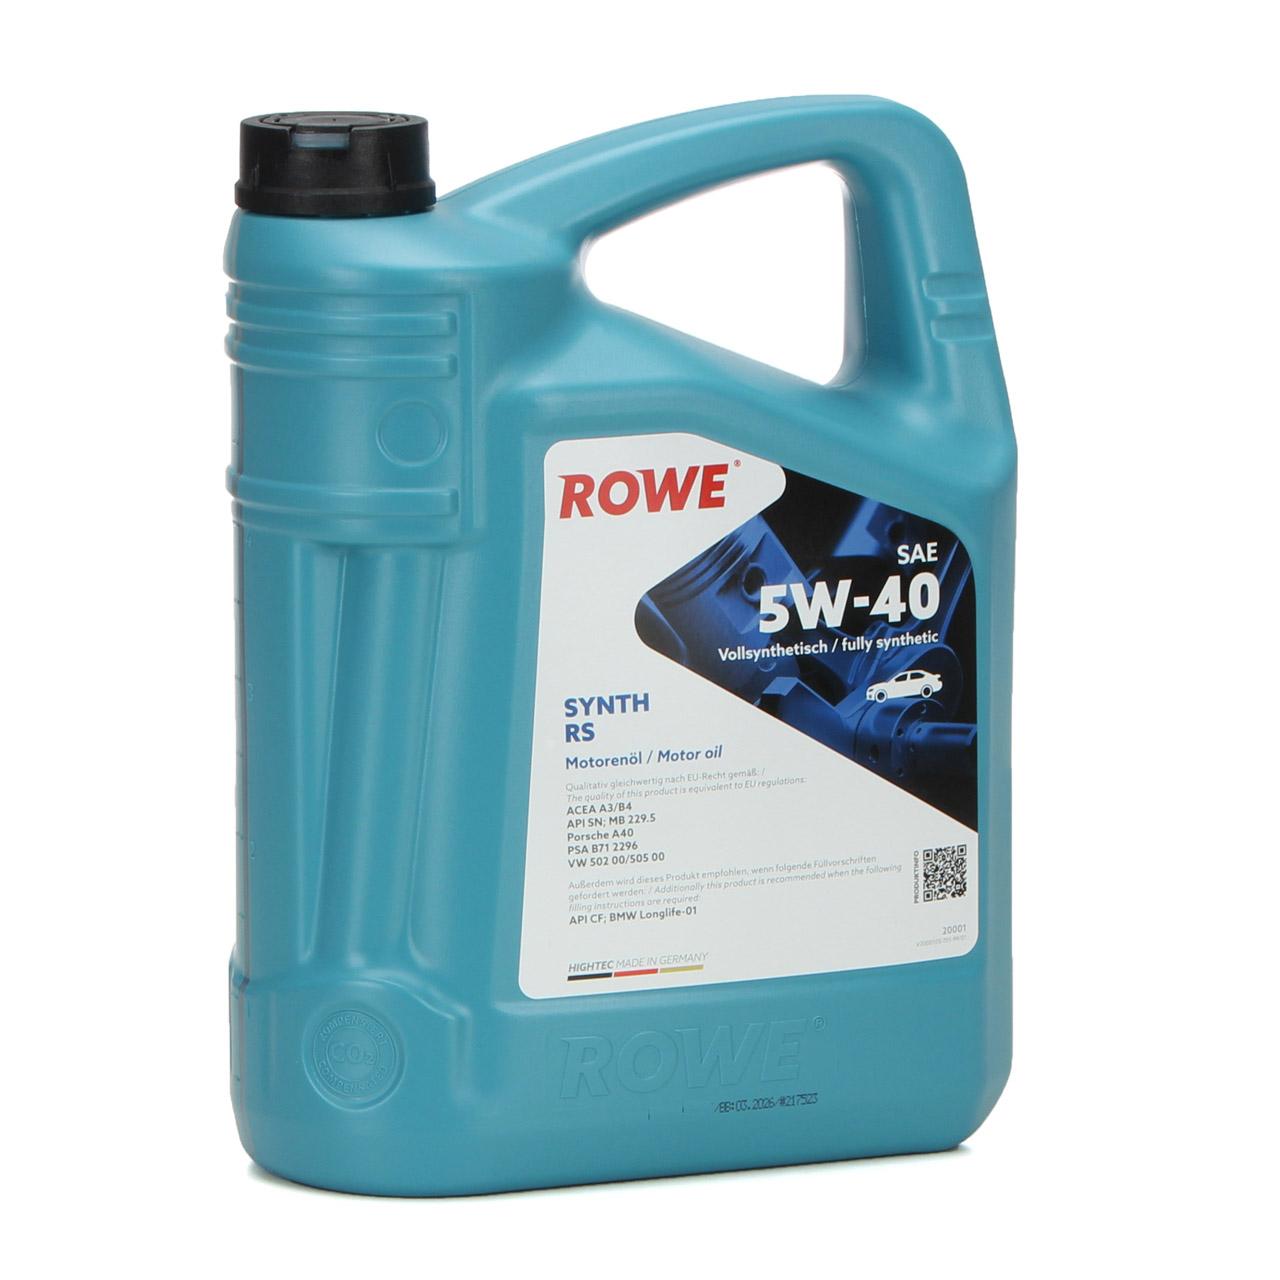 5L 5 Liter ROWE Motoröl Öl SYNTH RS 5W-40 MB 229.5 PSA B71 2296 VW 502.00/505.00